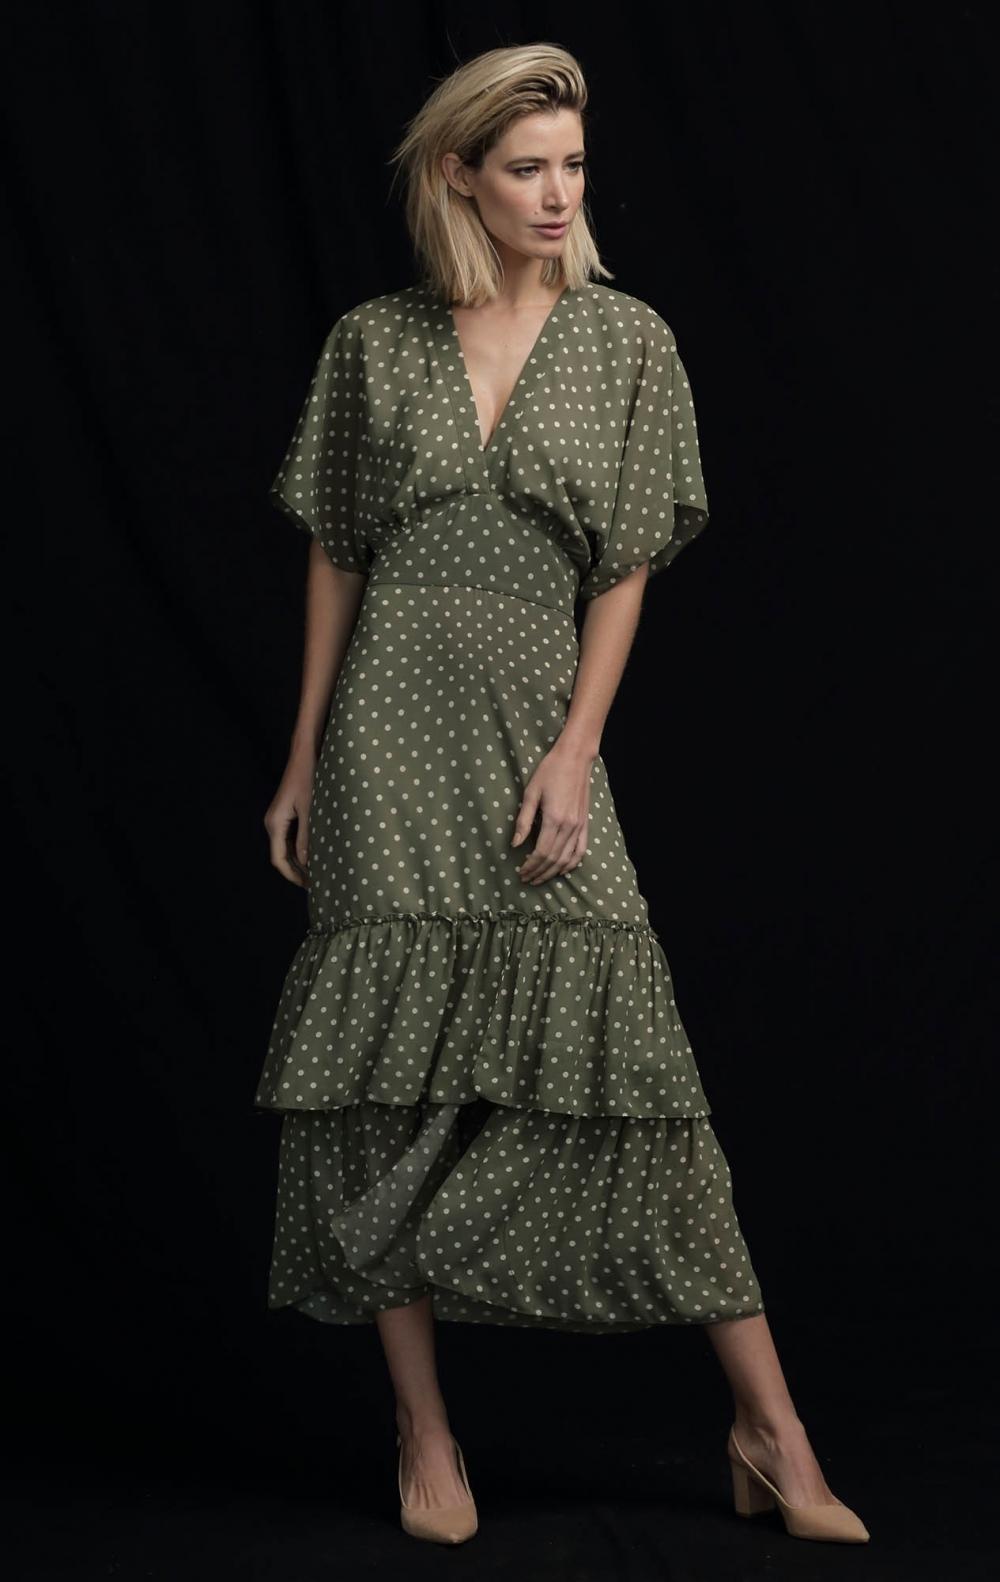 Vestido Musseline Bolas Verde Pistache - Foto 1